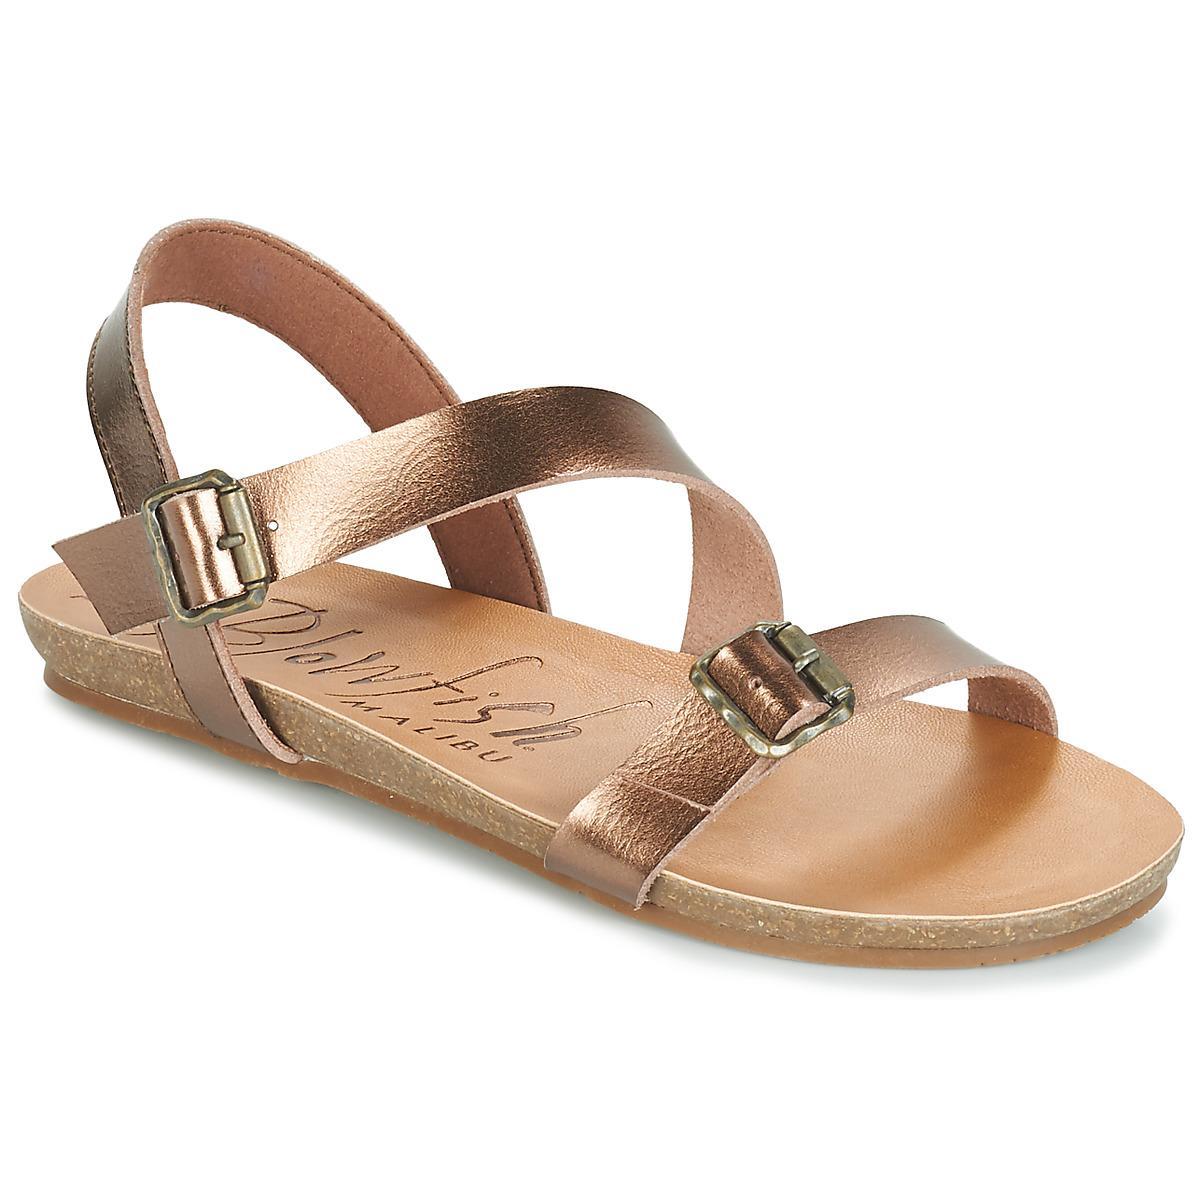 54123c12887 Blowfish Malibu Gallup Women s Sandals In Gold in Metallic - Lyst